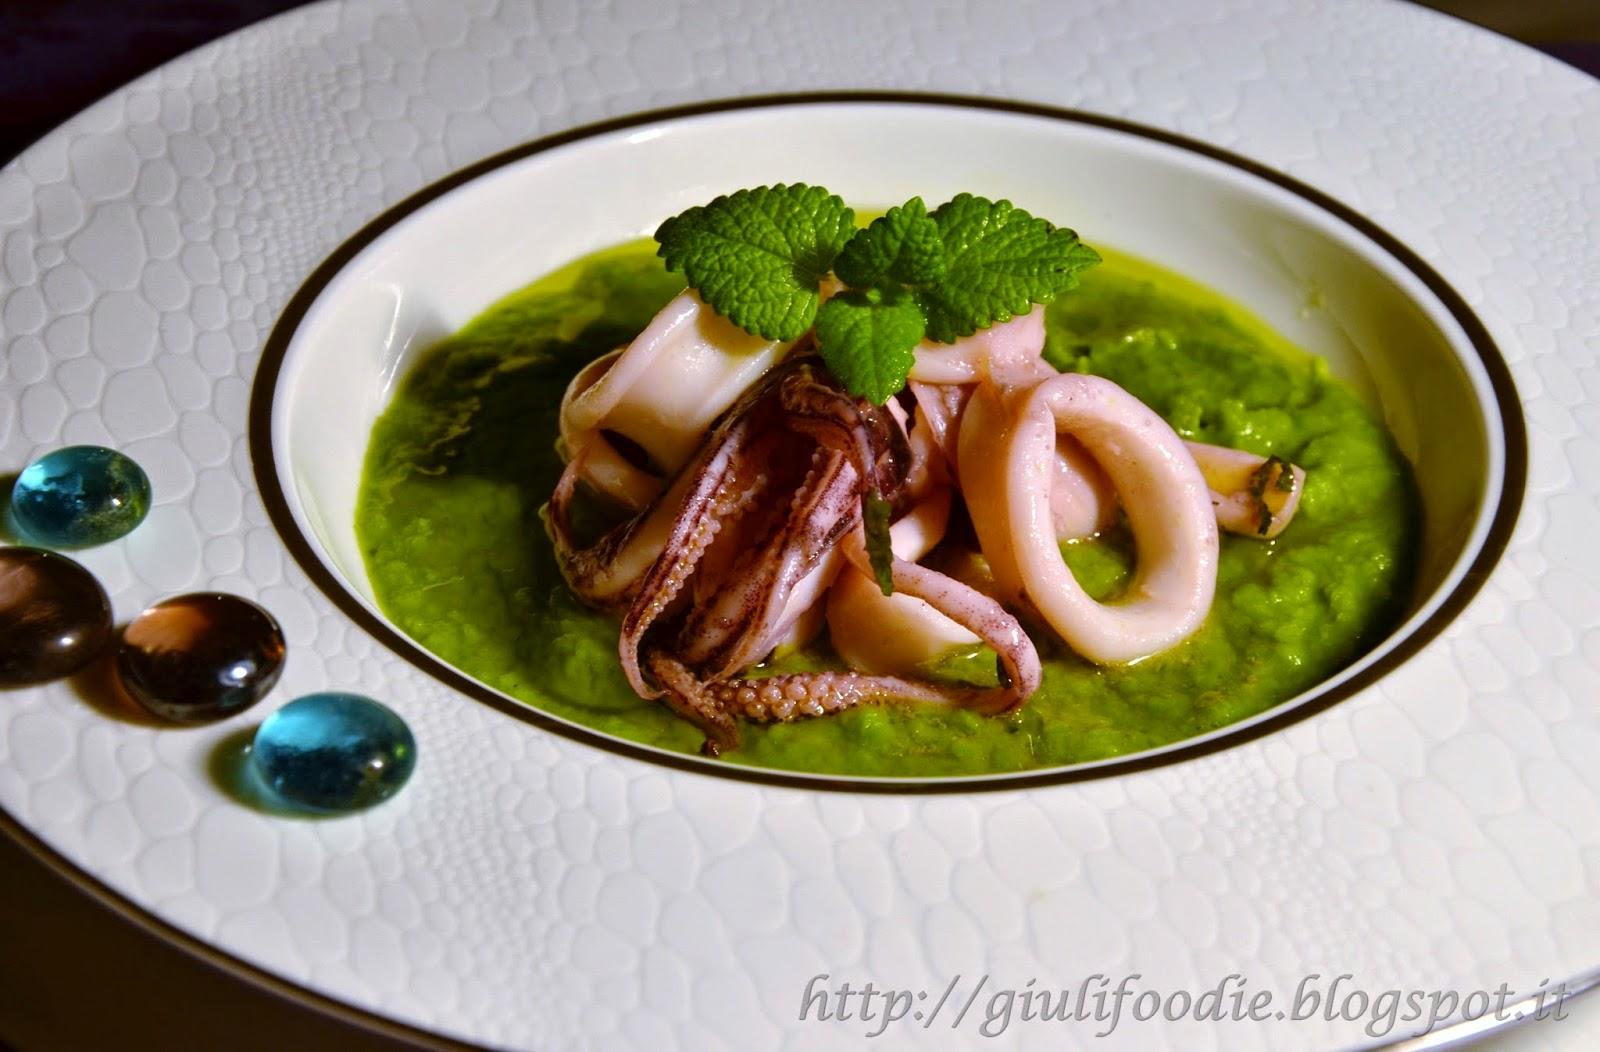 calamari con crema di piselli